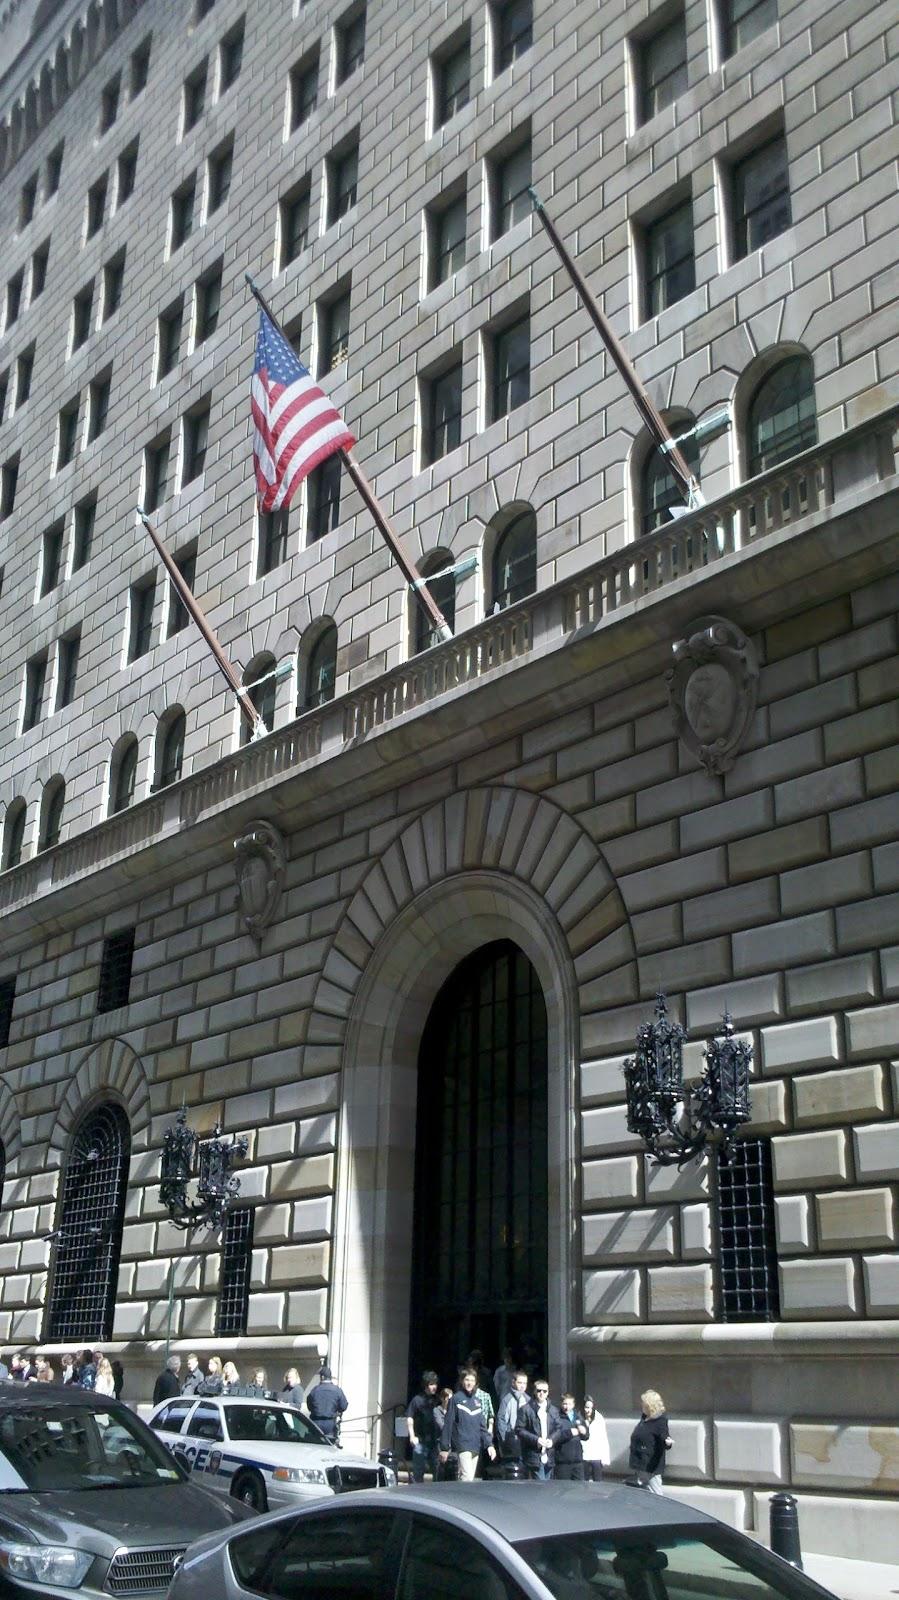 fédéral reserve board